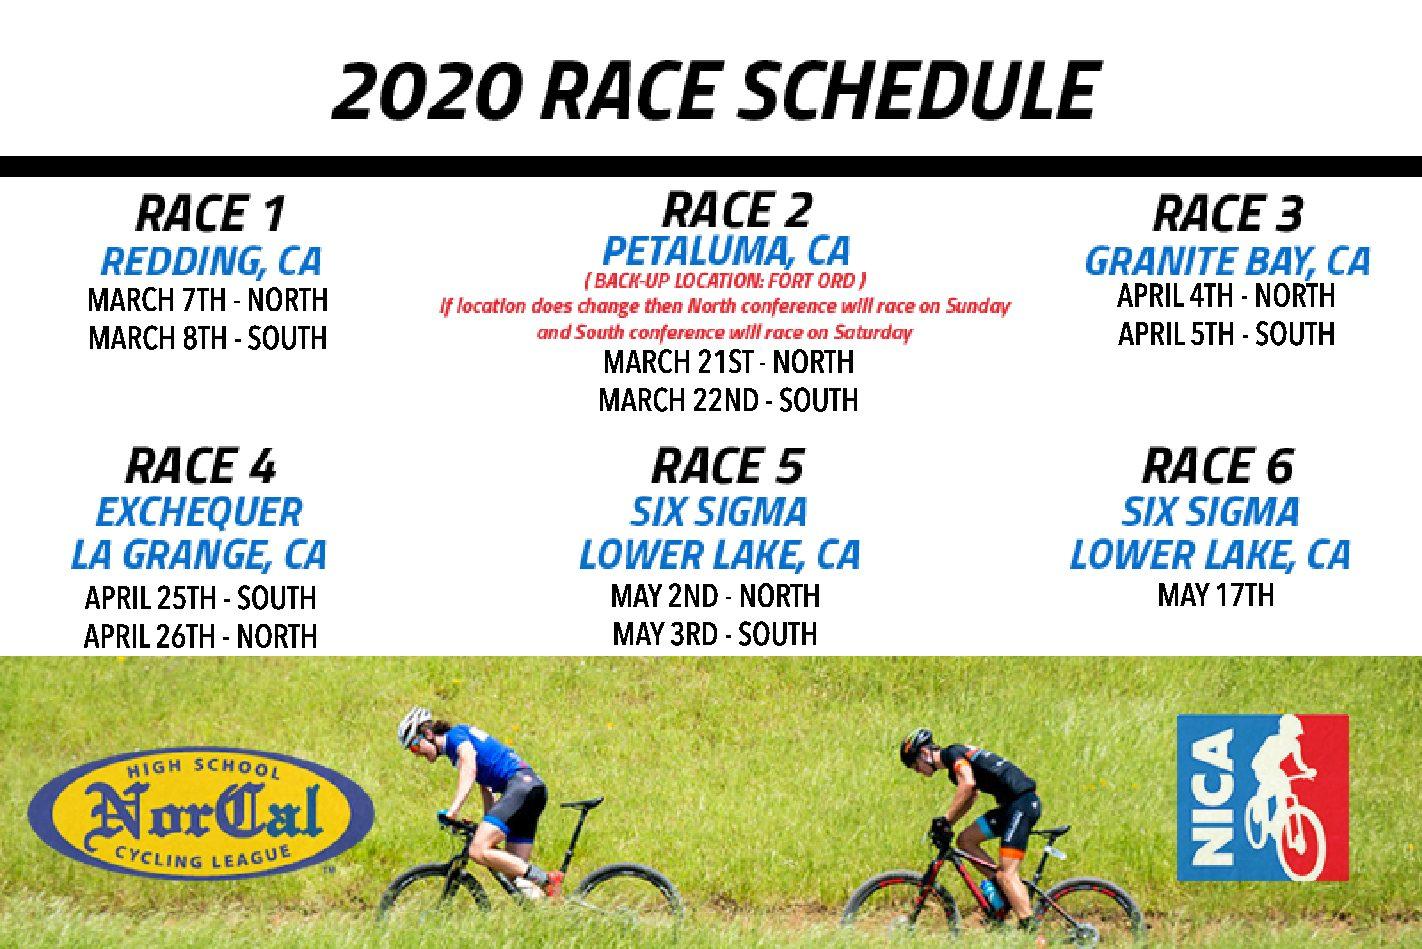 2020 Race Schedule